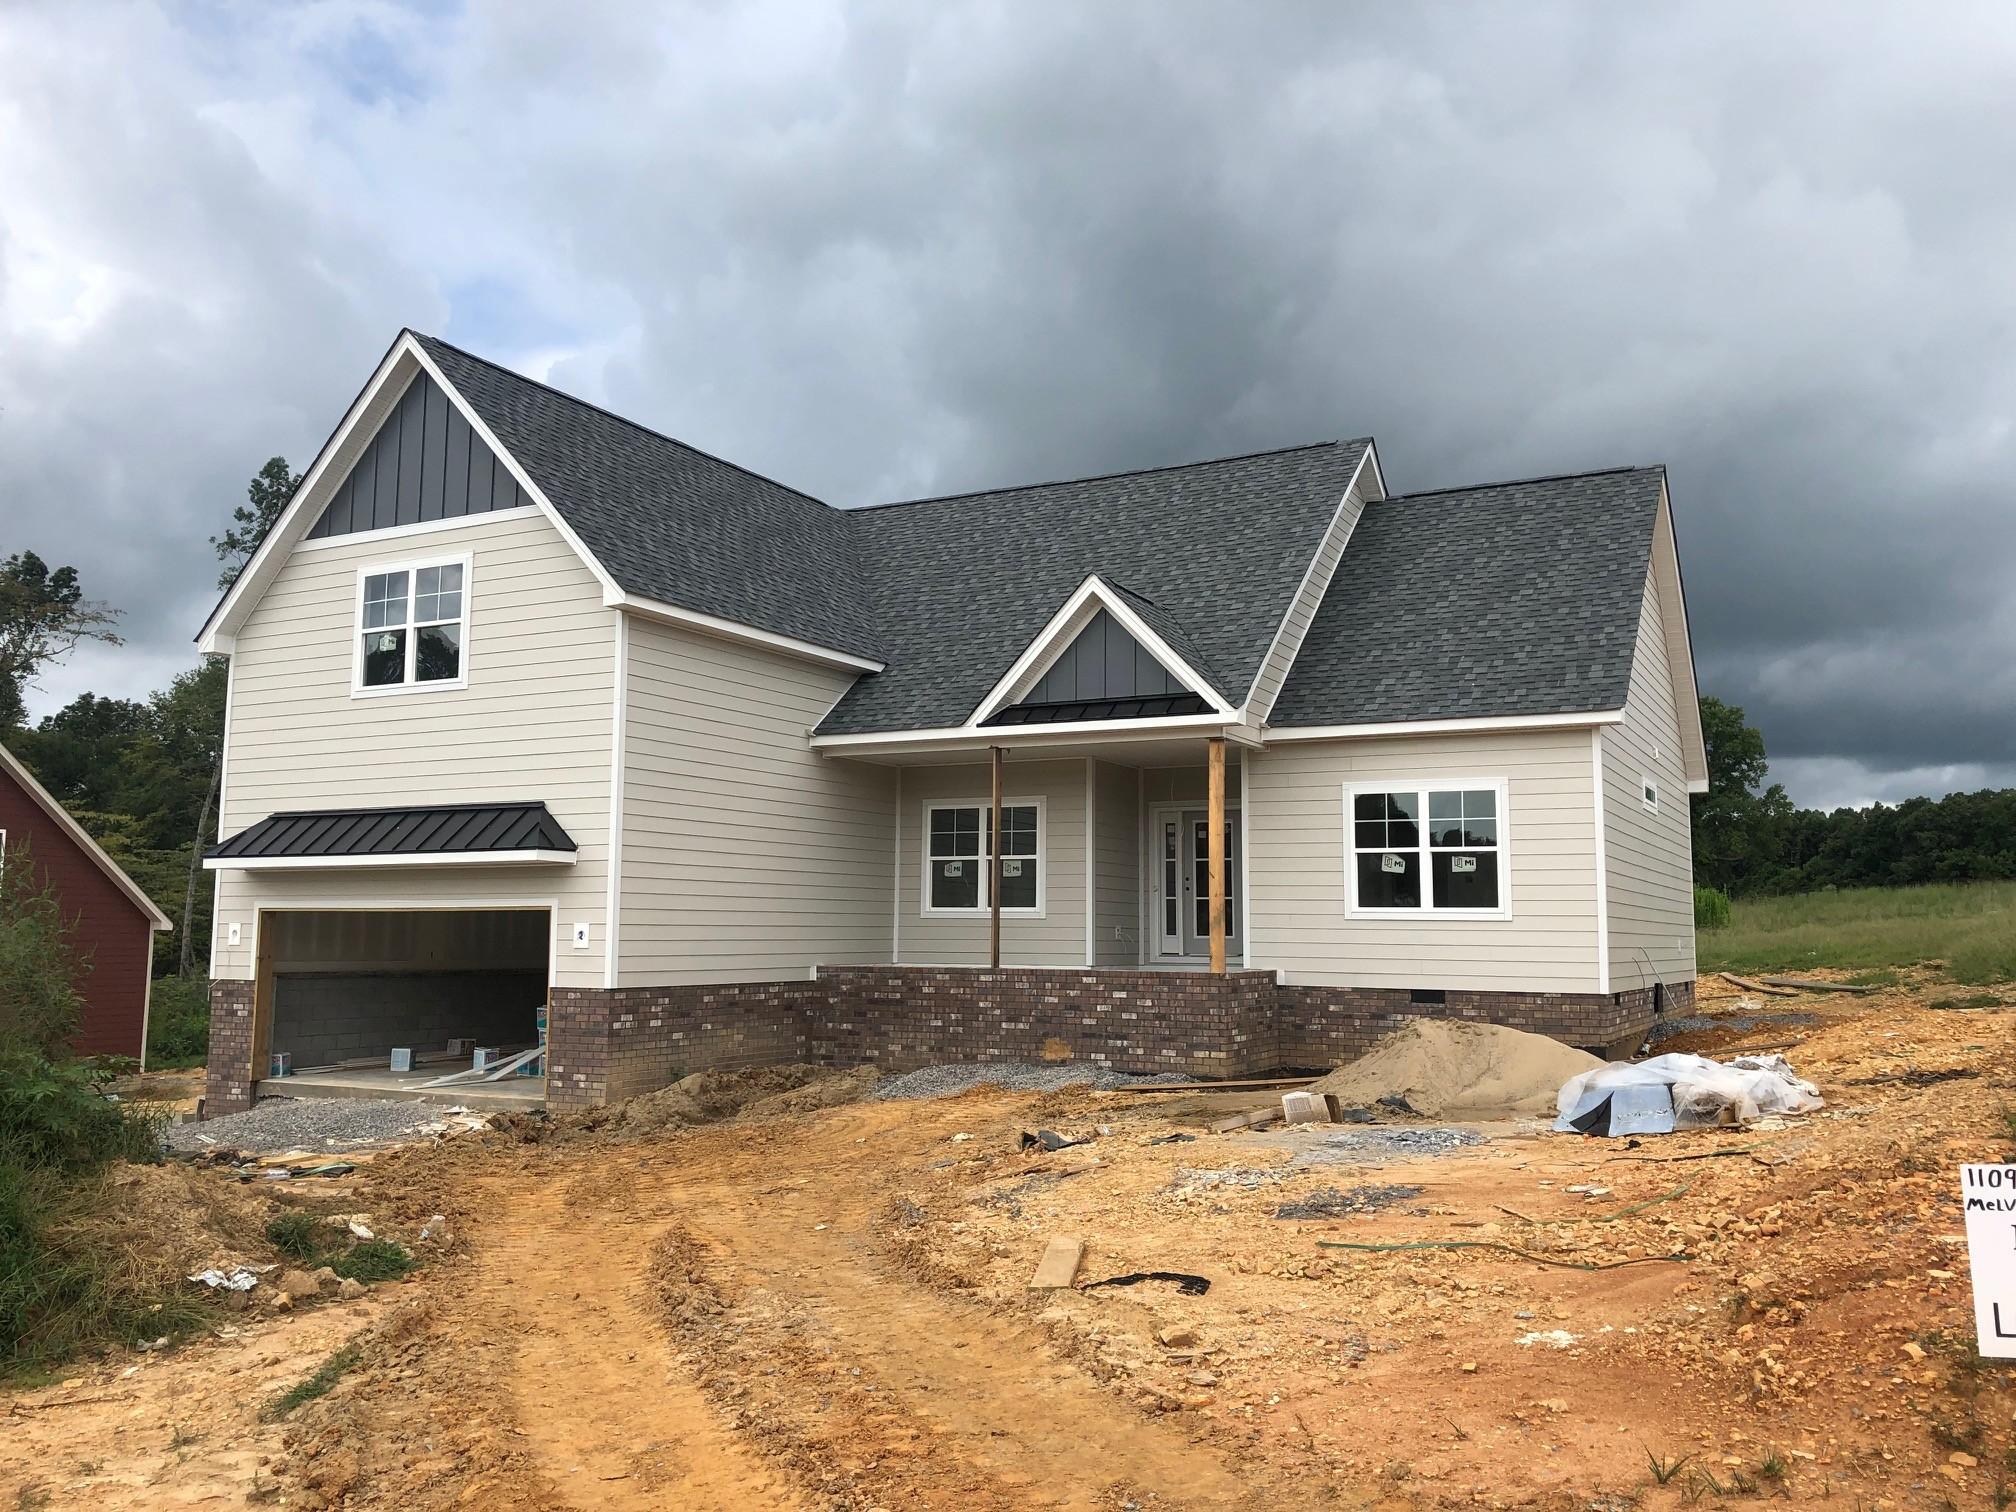 1109 Melvin Drive Property Photo - Cross Plains, TN real estate listing